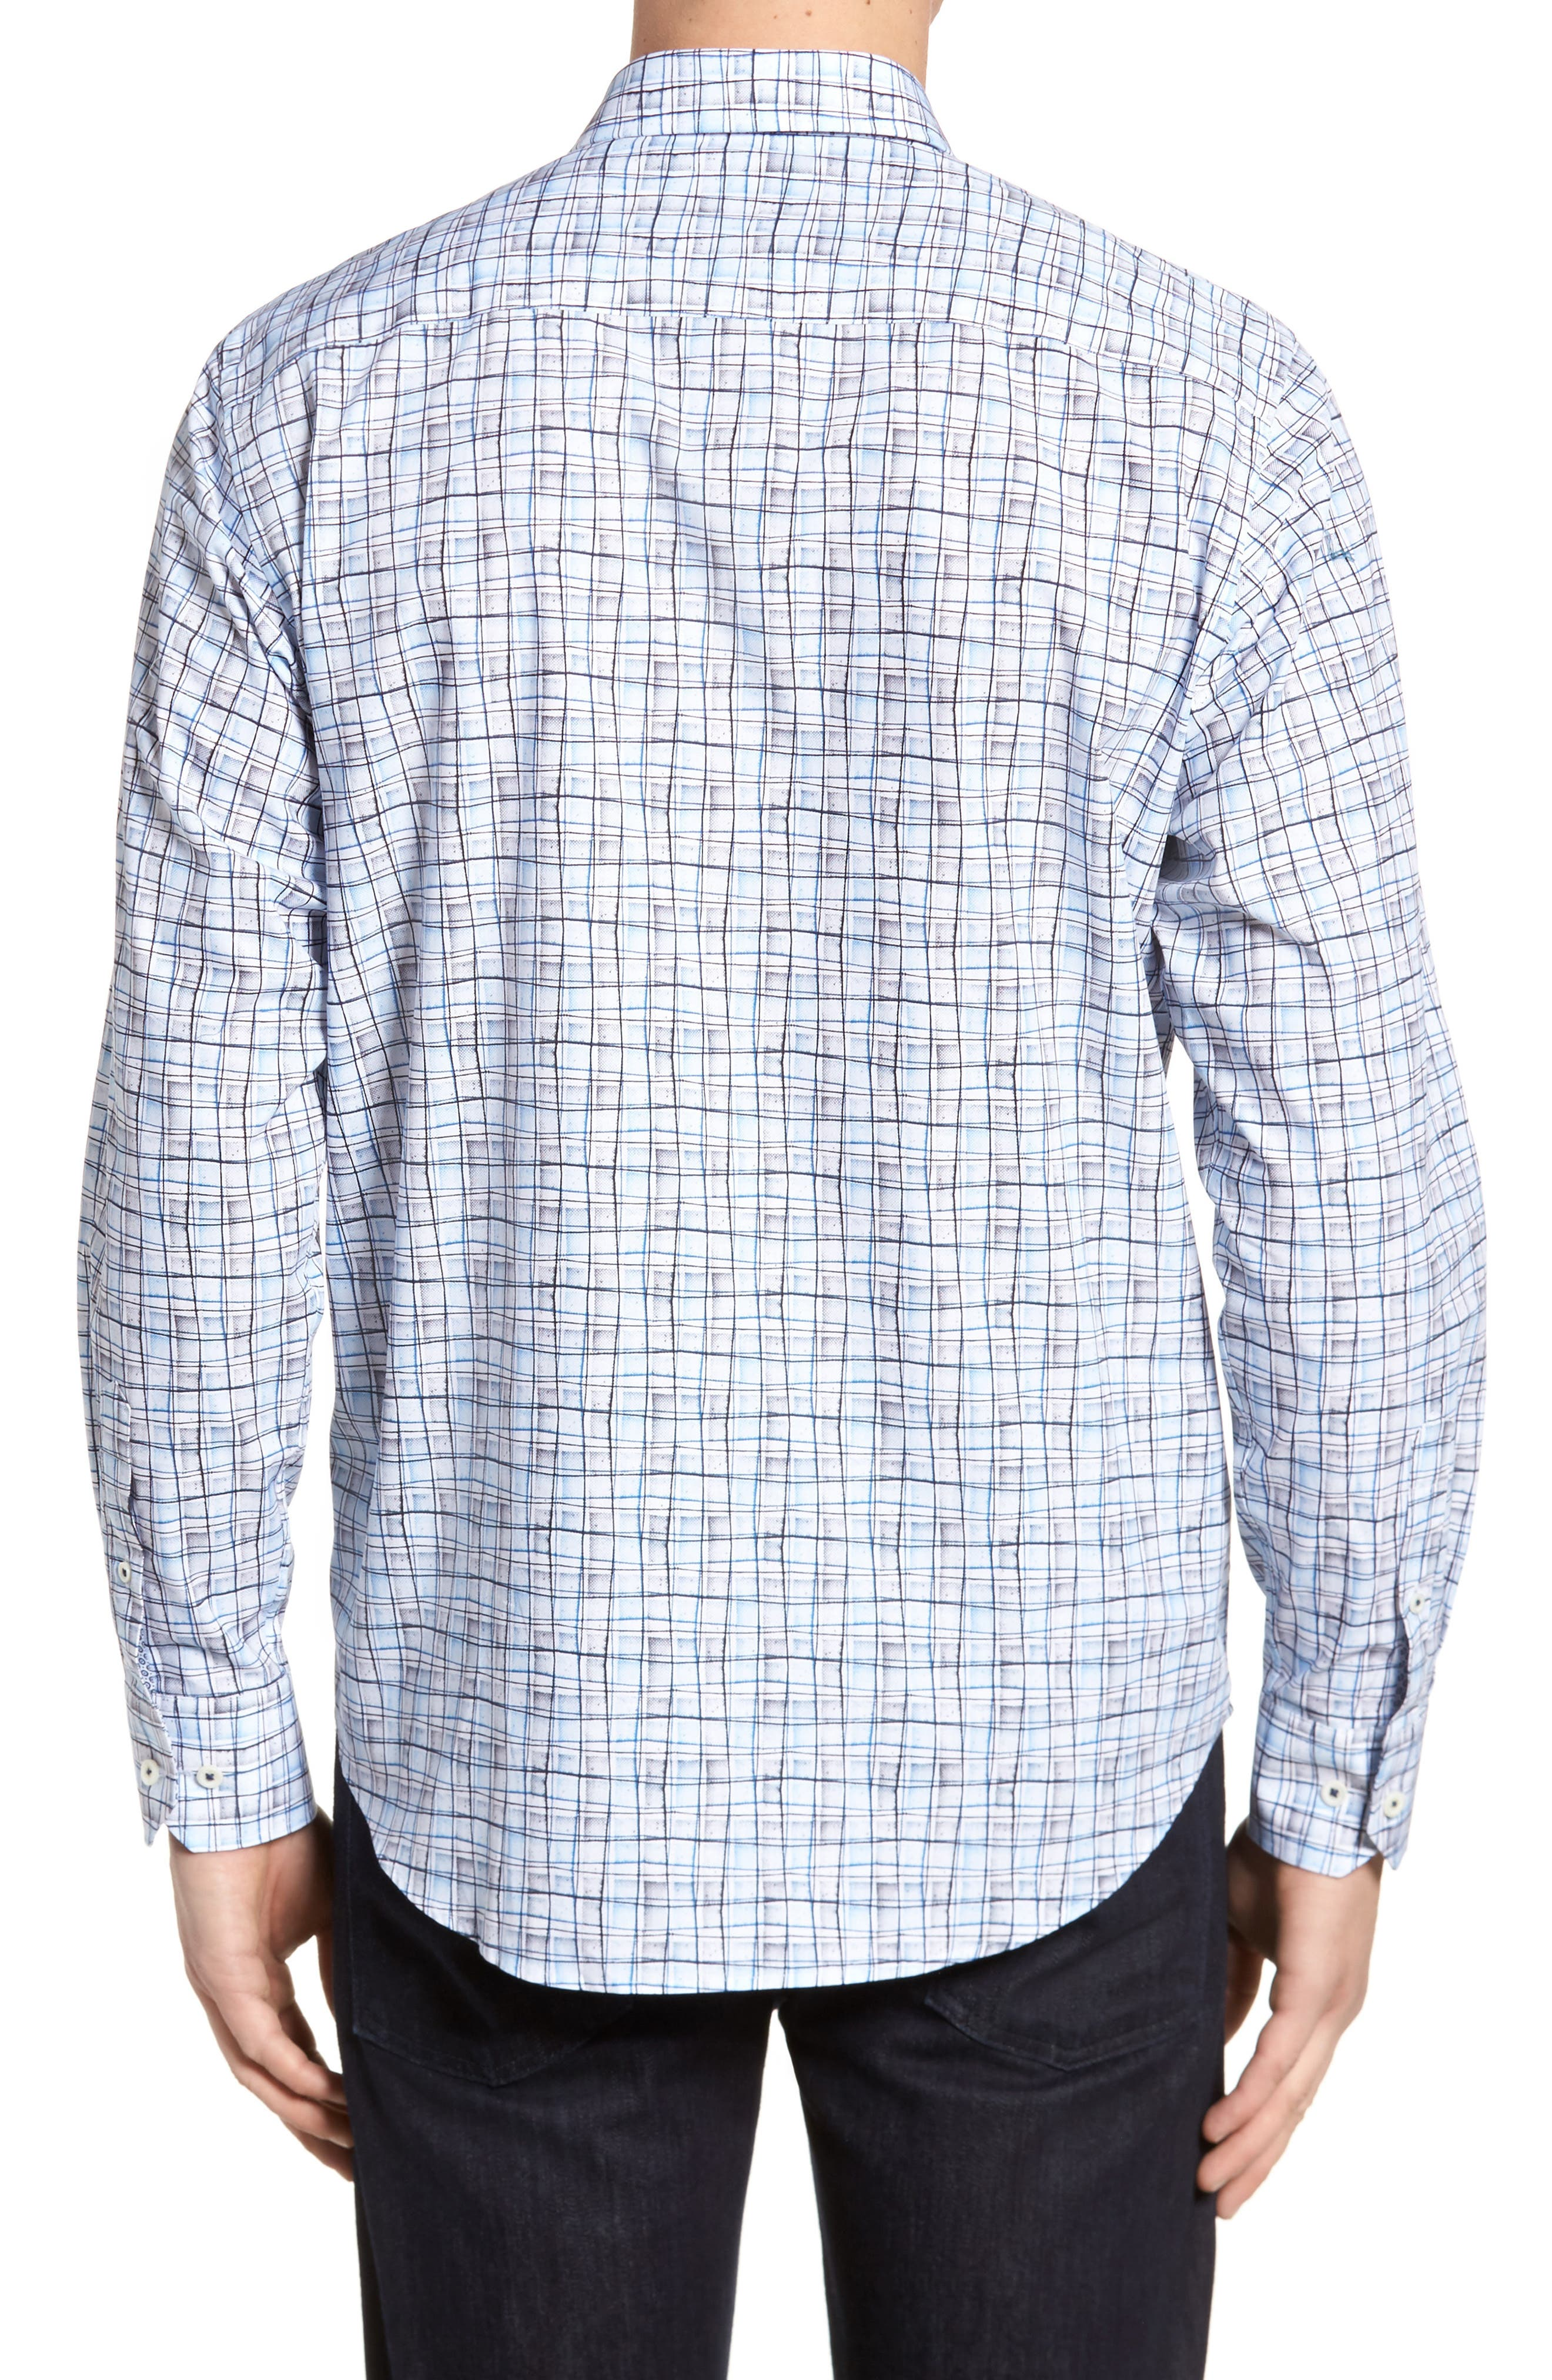 Regular Fit Grid Sport Shirt,                             Alternate thumbnail 2, color,                             040